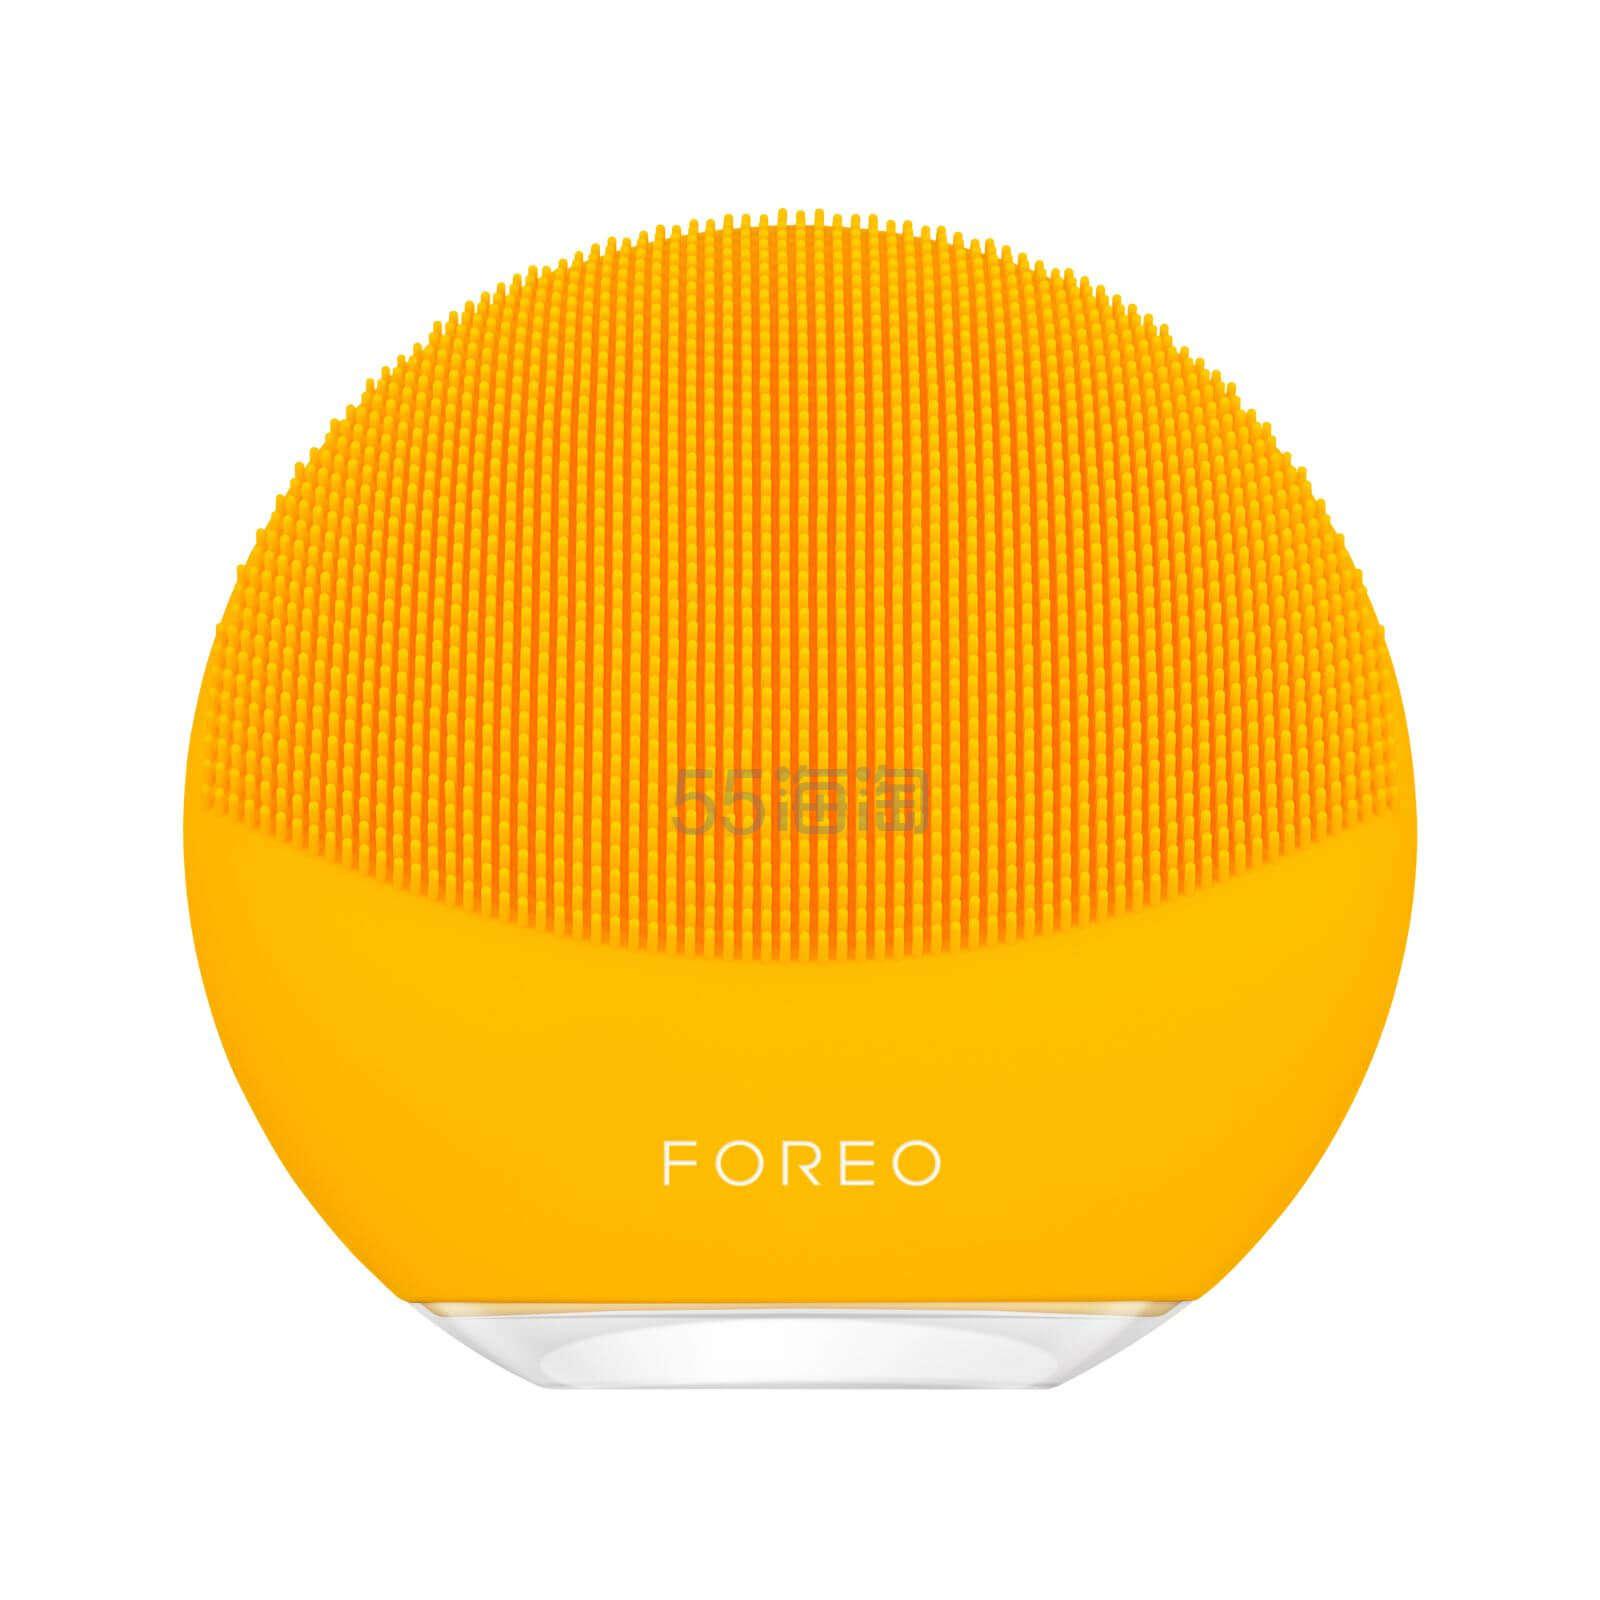 FOREO mini 3 迷你3代洁面仪 多色可选 £104.25(约930元) - 海淘优惠海淘折扣|55海淘网